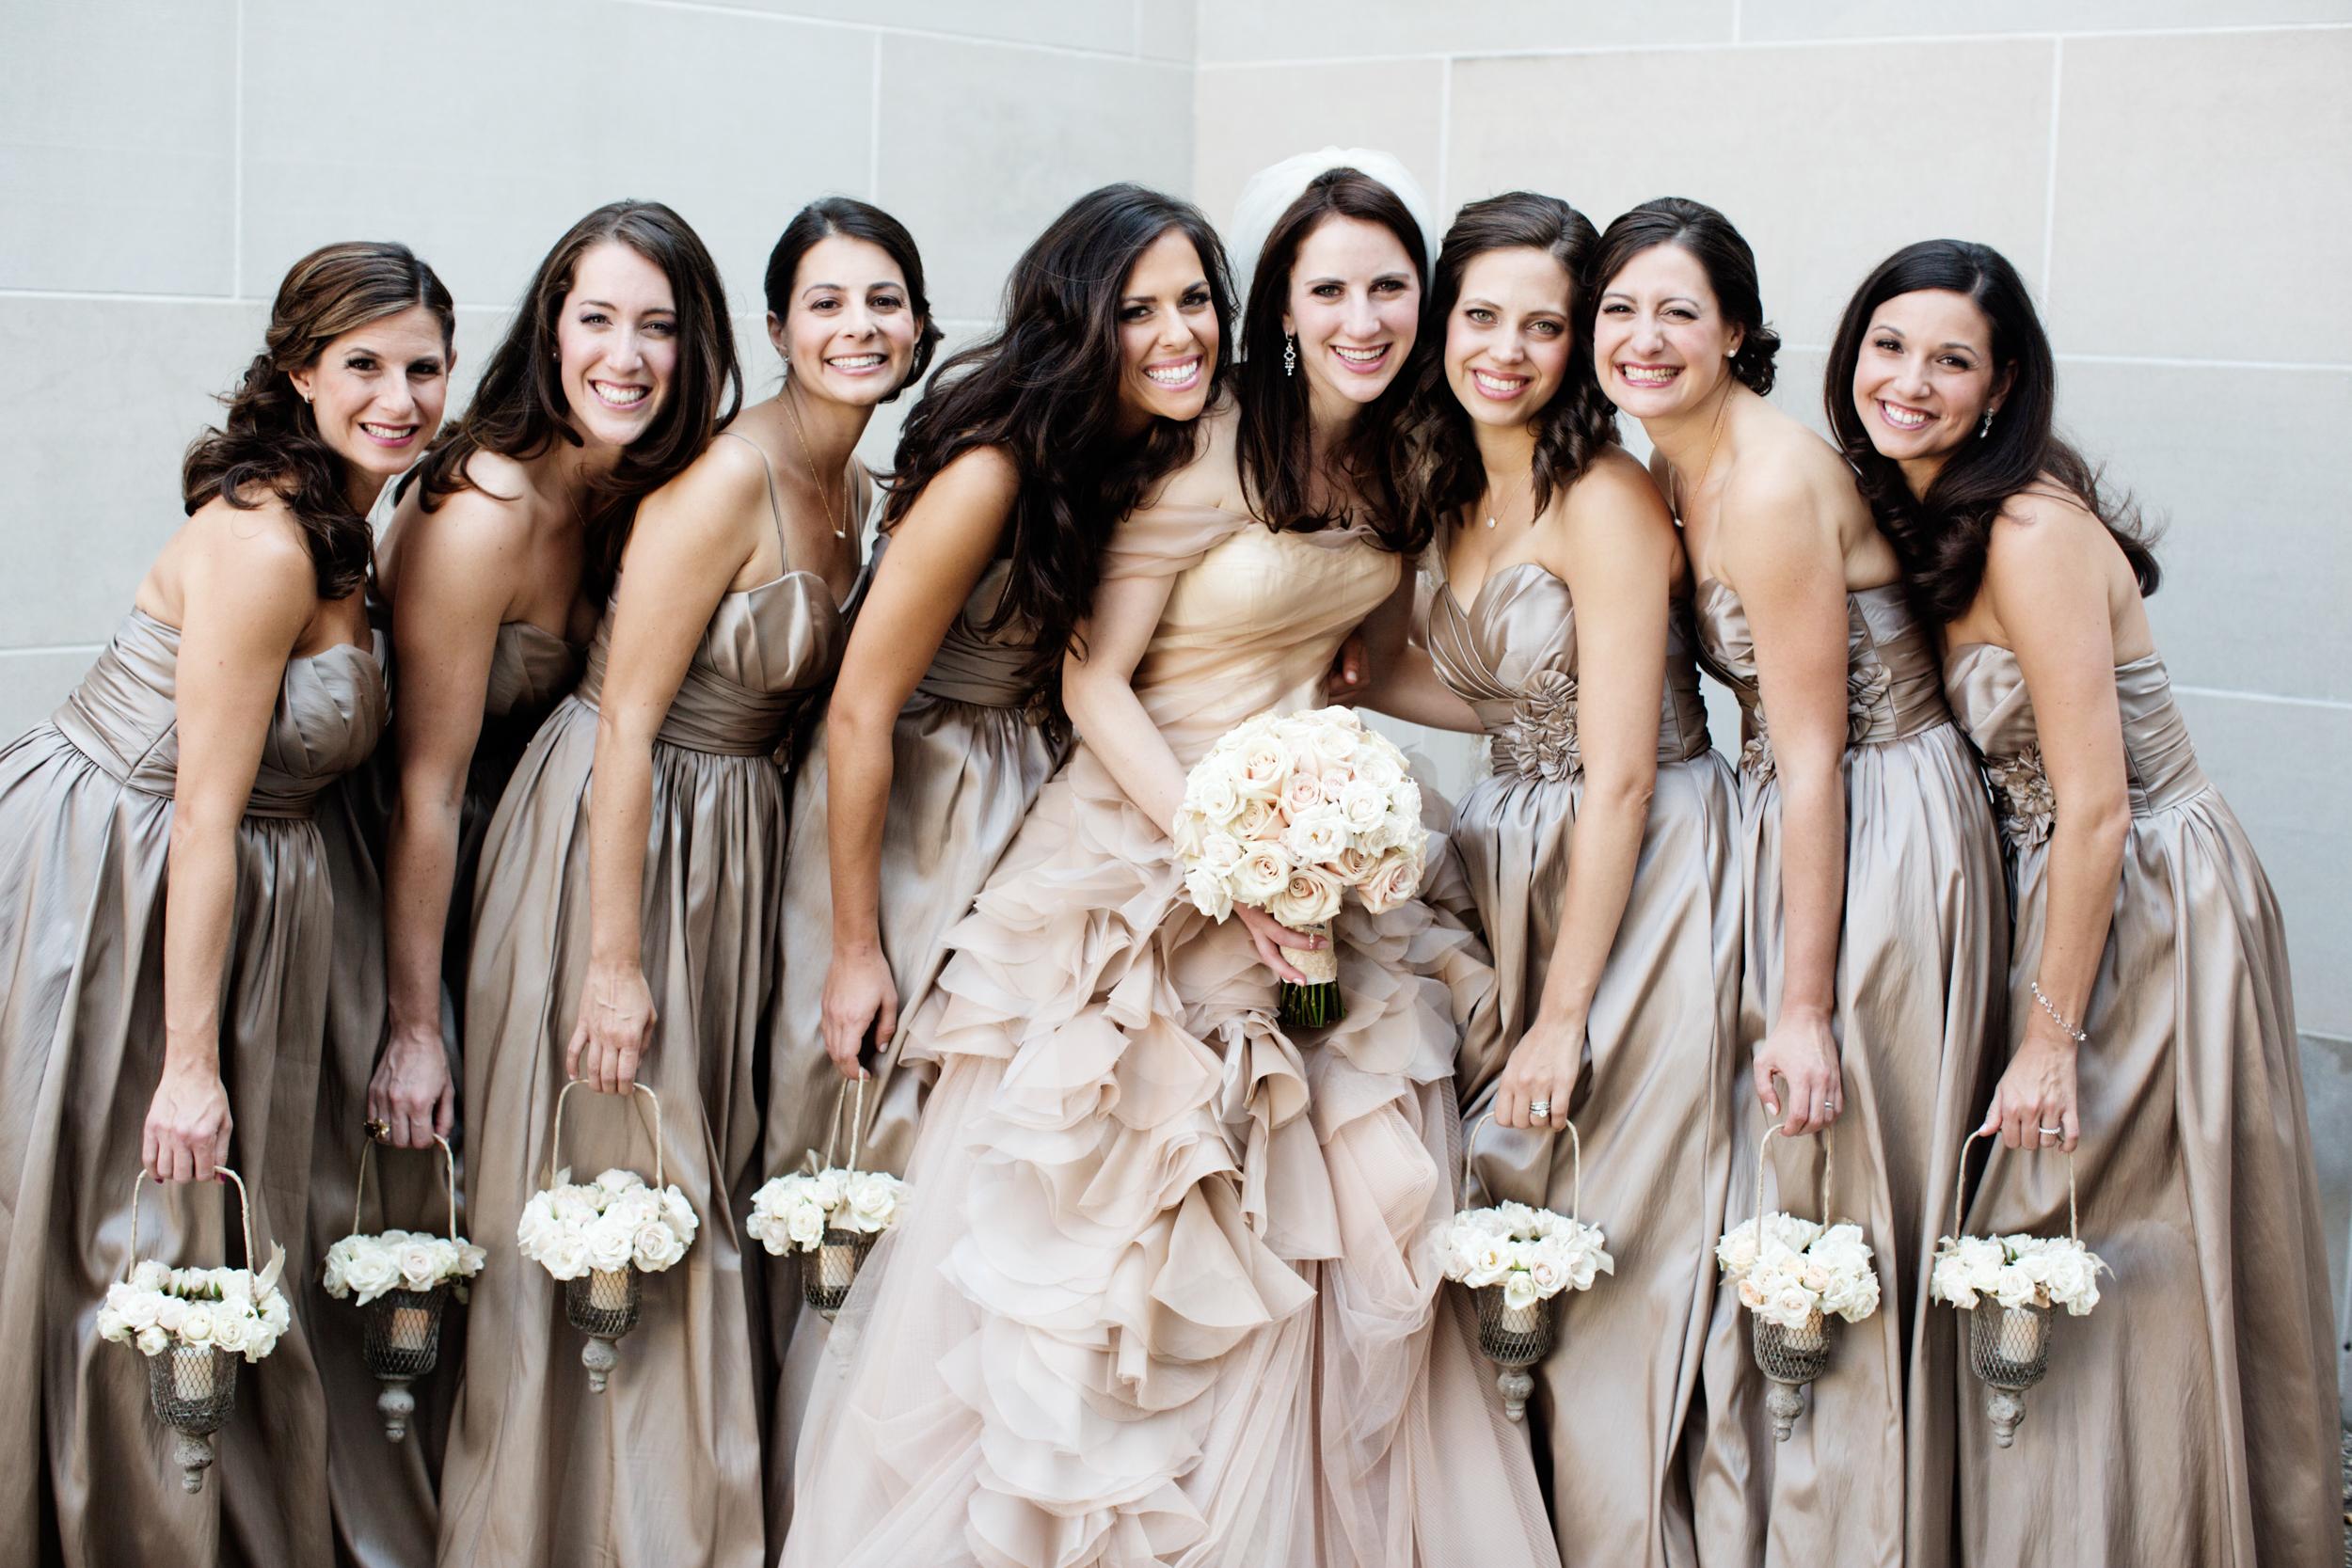 Ceci_New_York_Ceci_Style_Ceci_Johnson_Luxury_Lifestyle_Floral_Lace_Wedding_Letterpress_Inspiration_Design_Custom_Couture_Personalized_Invitations_-58.jpg